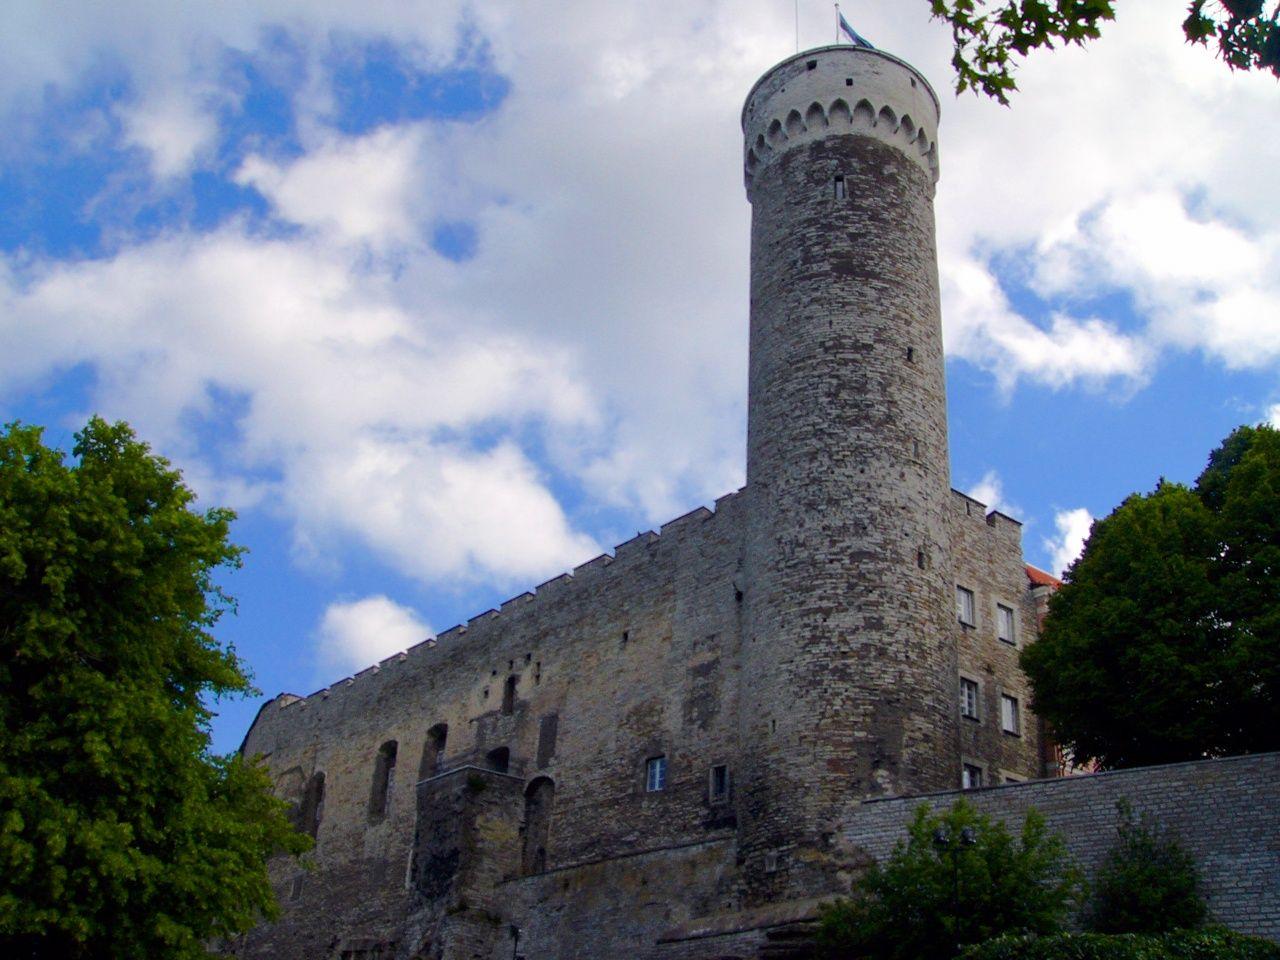 SIGHTS. Toompea Castle. Toompea Castle is the seat of the Parliament of the Republic of Estonia - the Riigikogu.